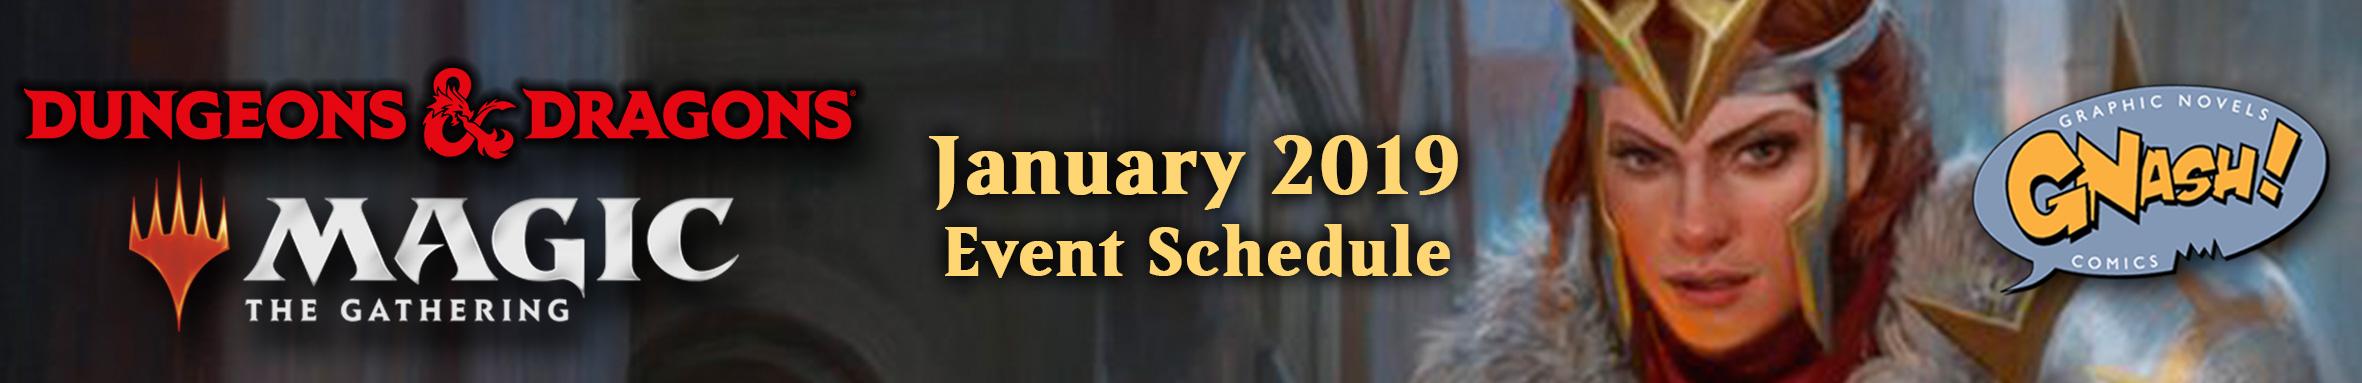 magic-gathering-january-2019-banner